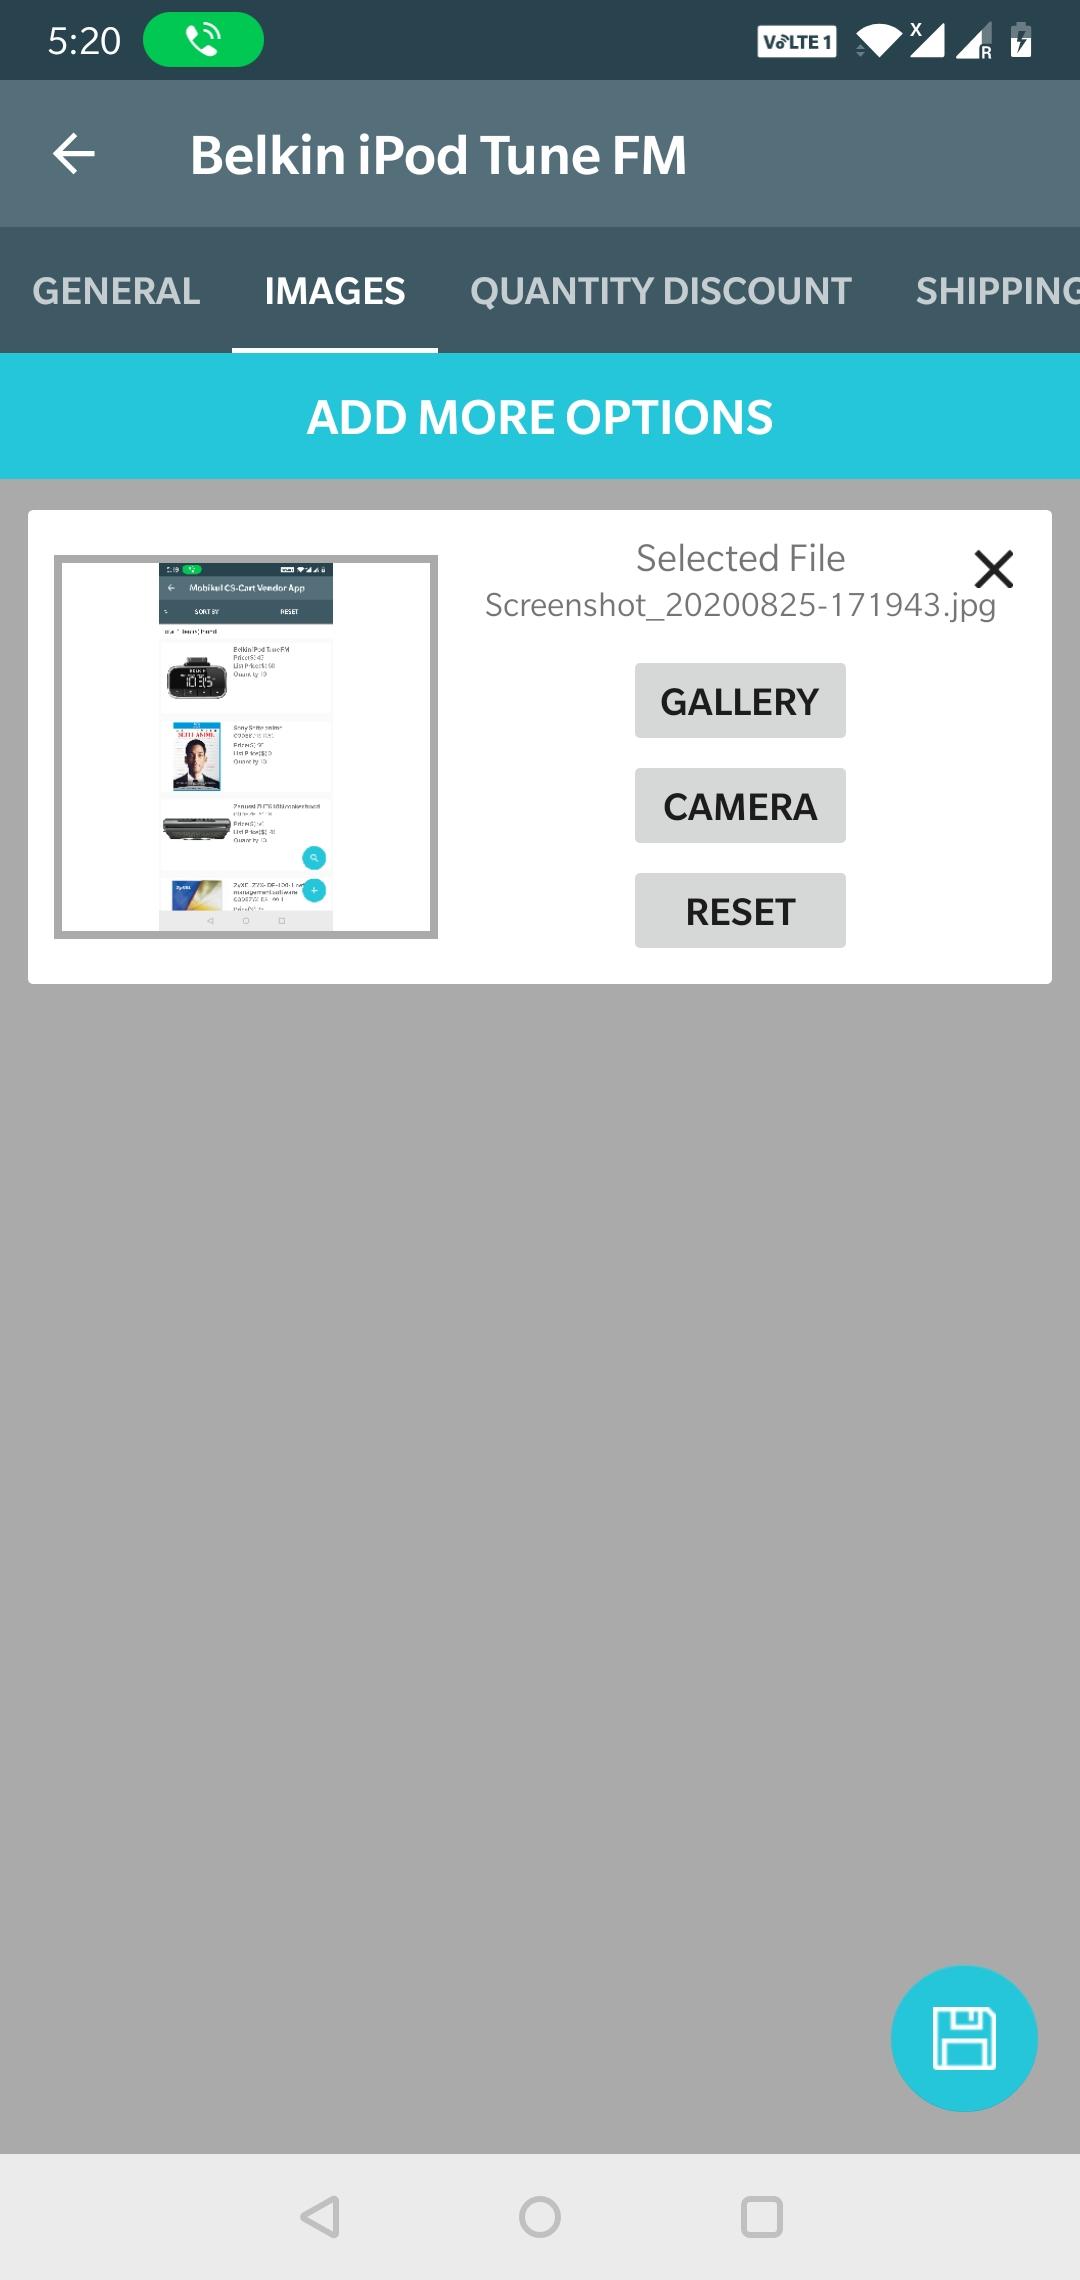 webkul-mobikul-cs-cart-vendor-app-Seller-Centric-features-2